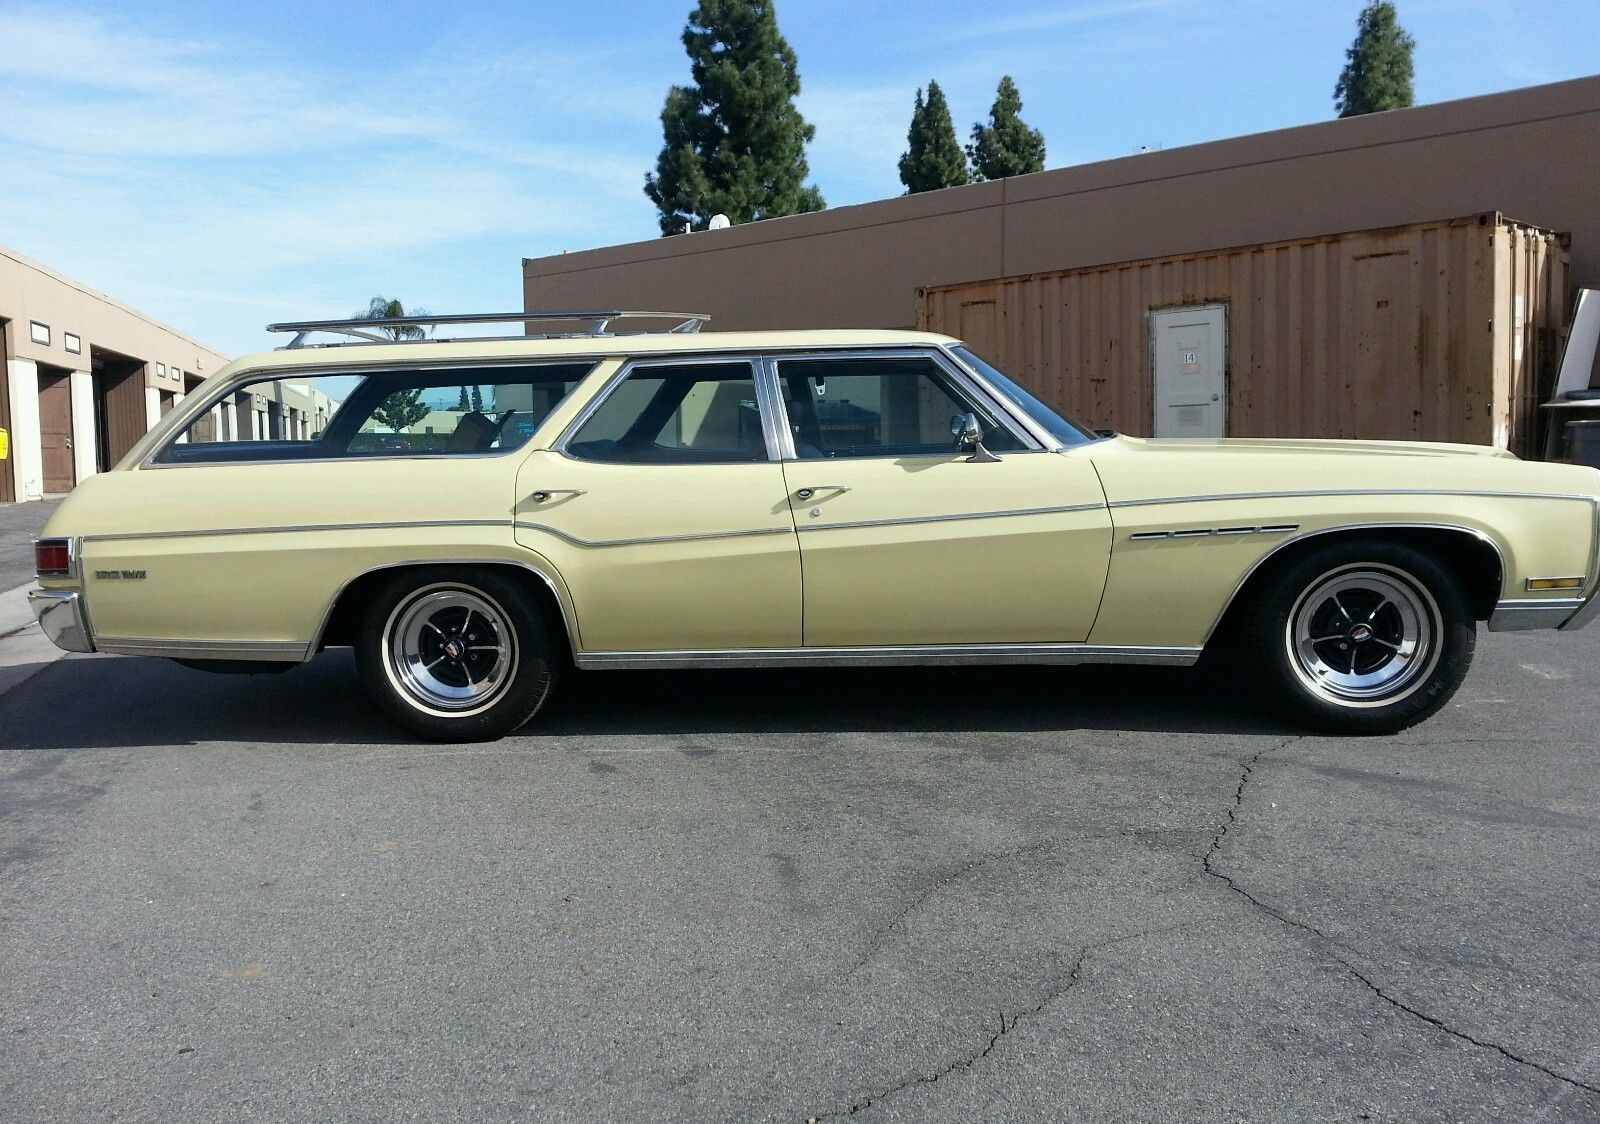 A Long Story 1970 Buick Estate Wagon